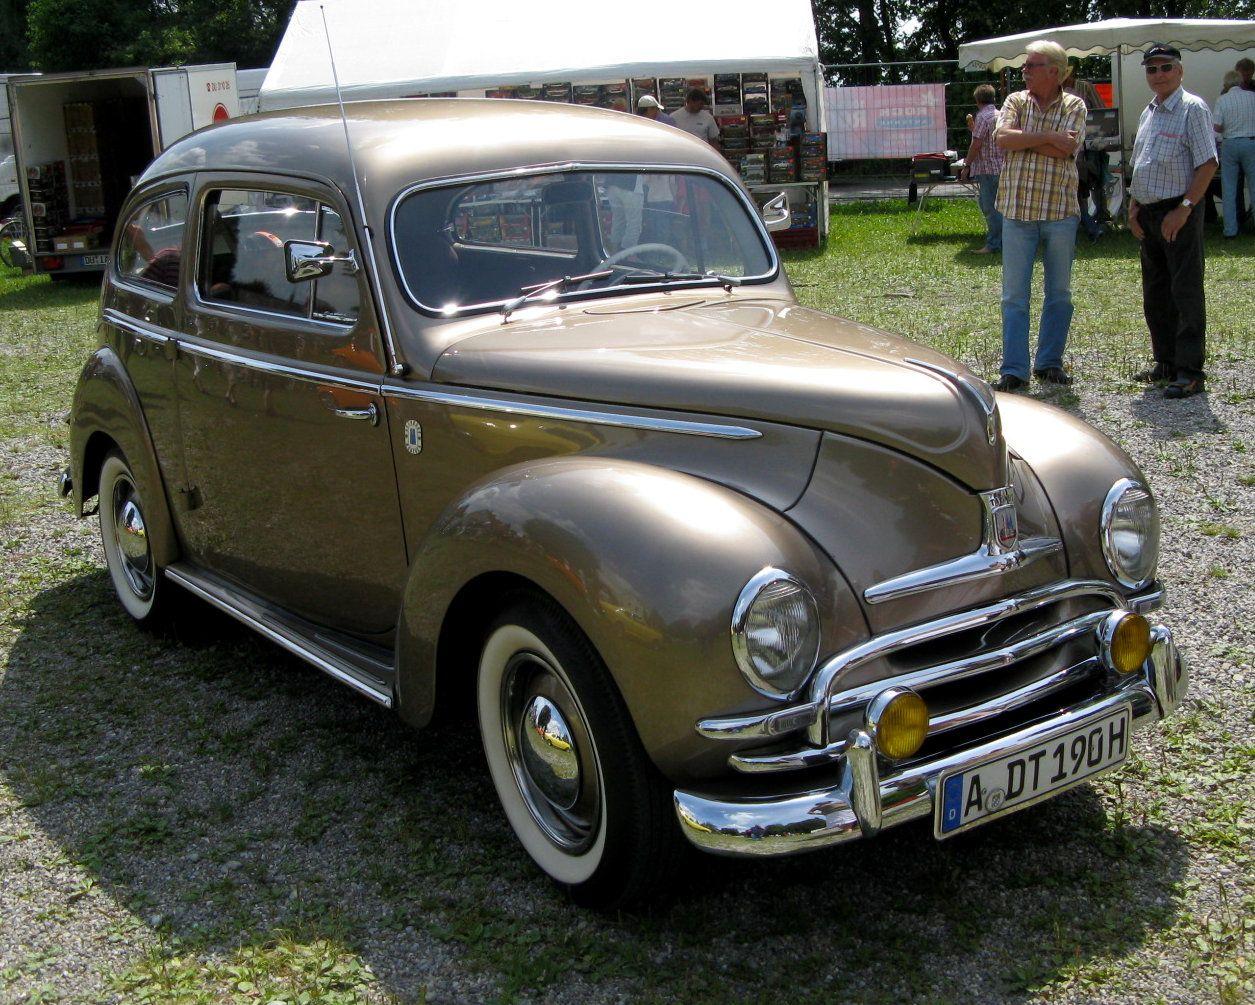 1951 Ford Taunus Carros Kombi Carros Antigos